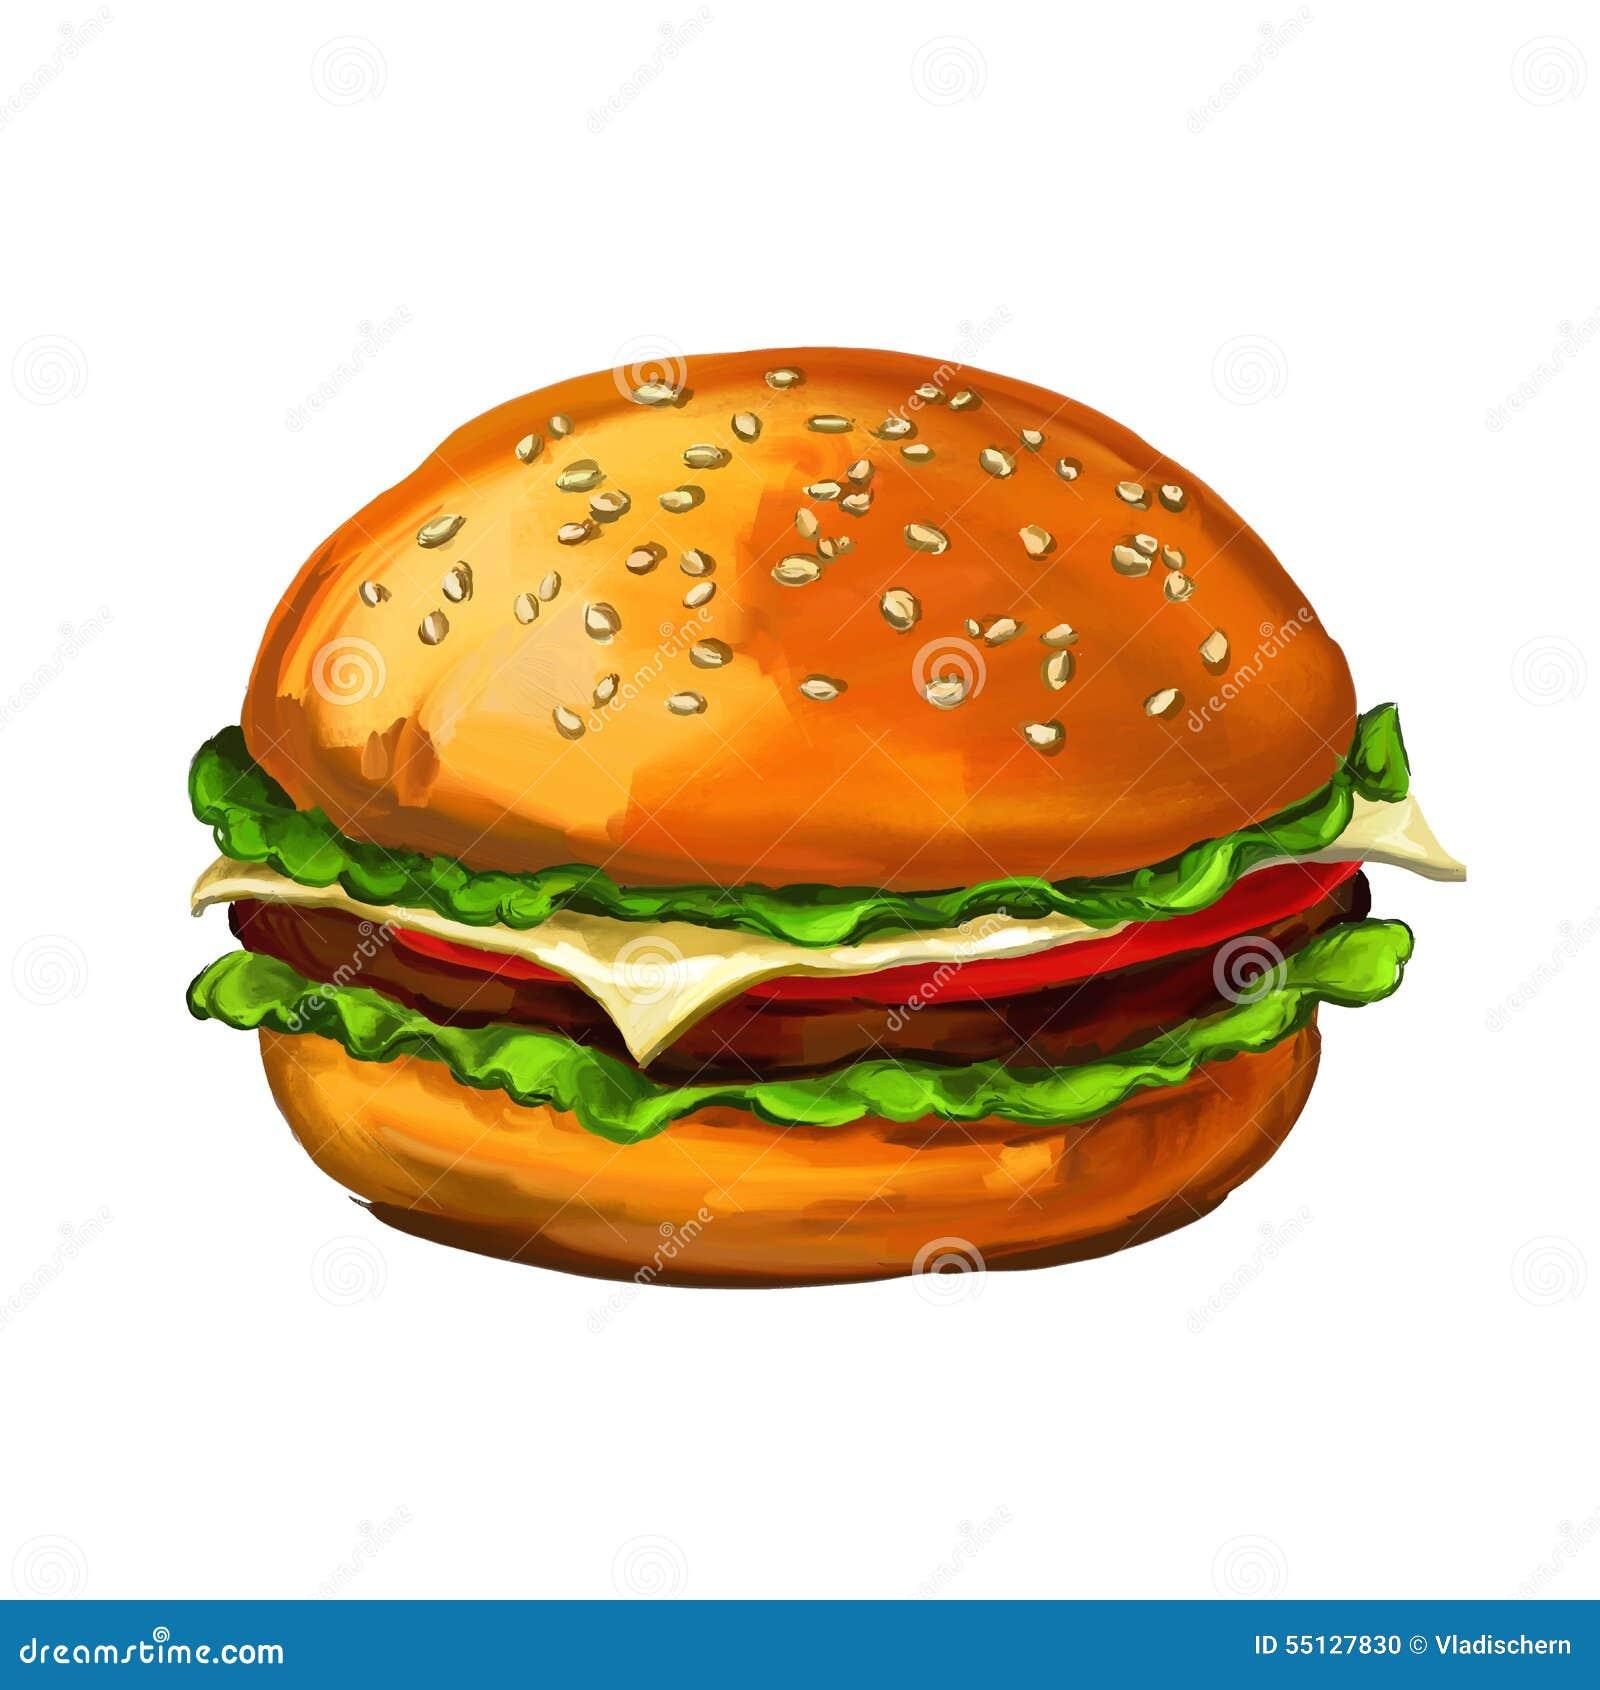 how to make hand pressed hamburgers